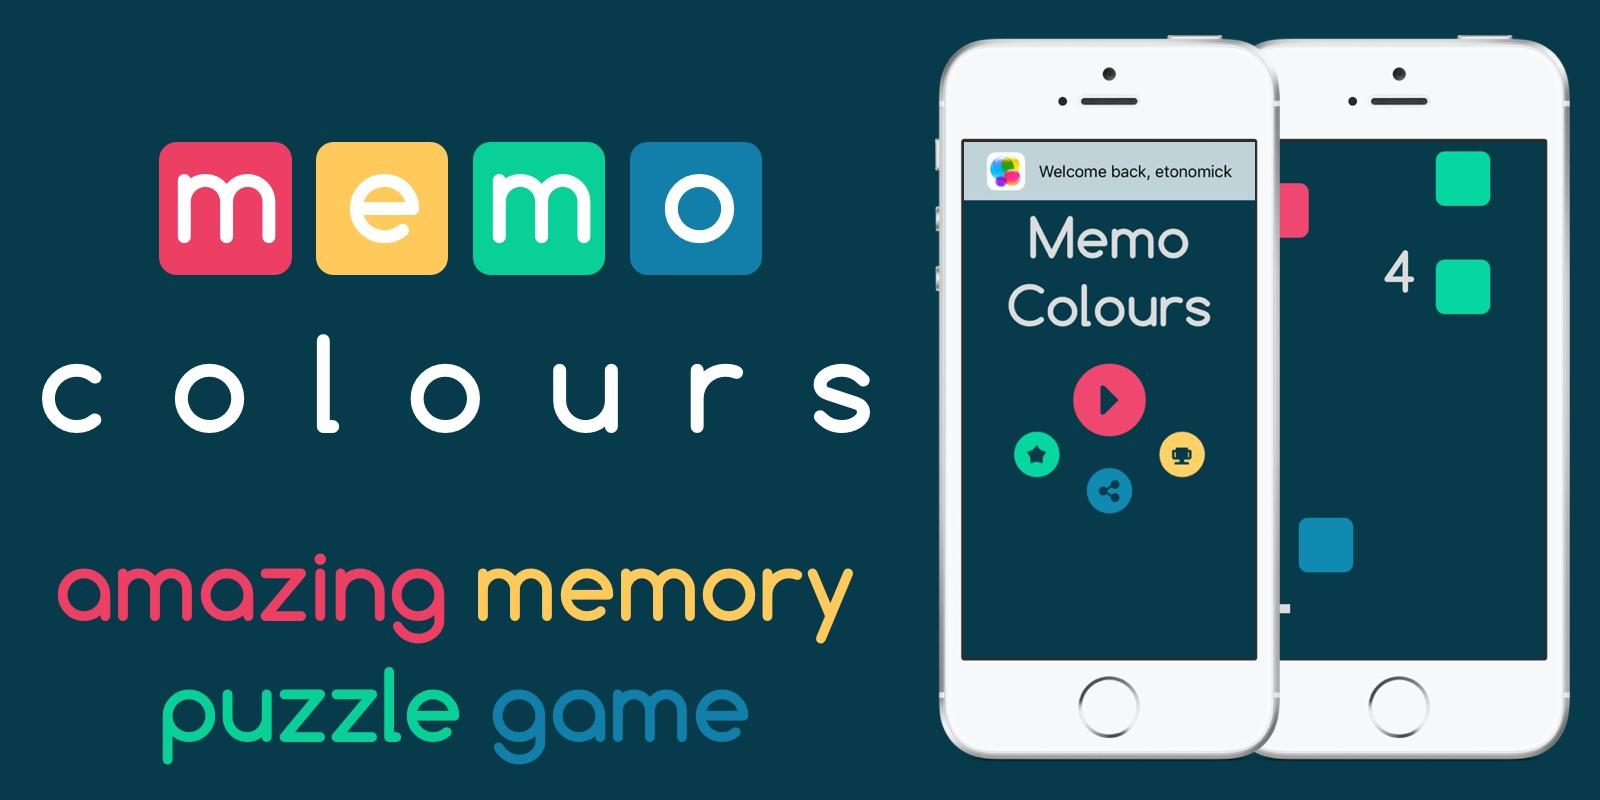 Memo Colours - iOS Game Source Code